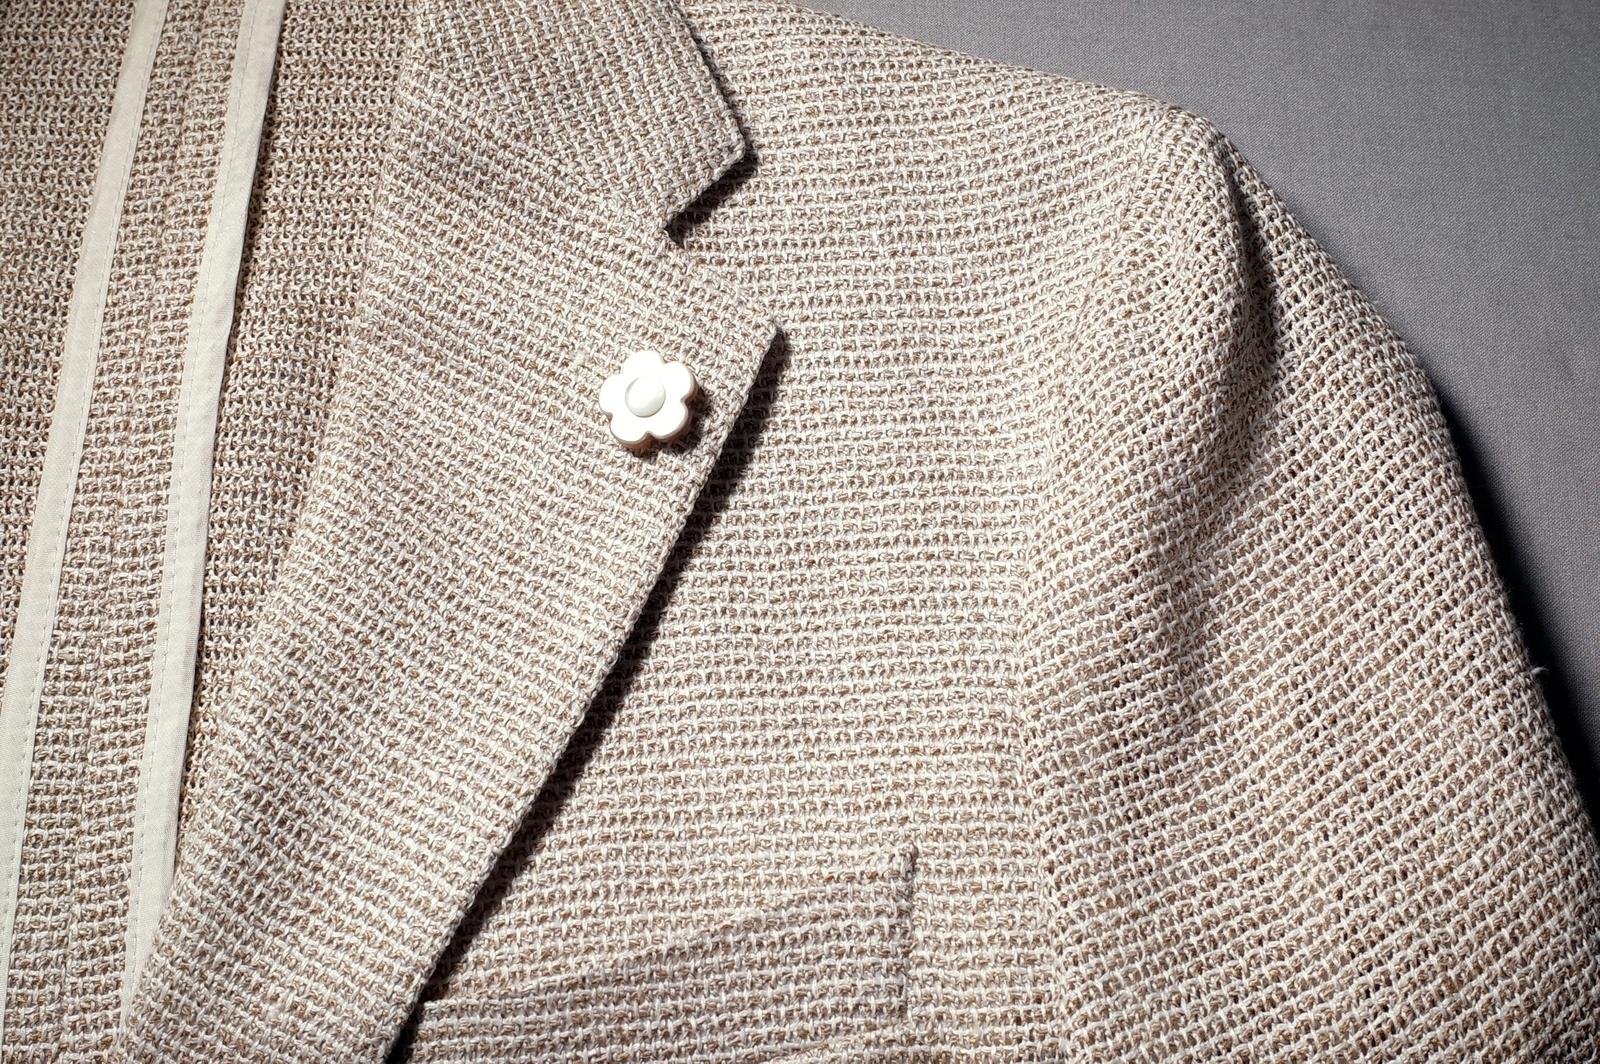 f:id:suits:20200719230013j:plain